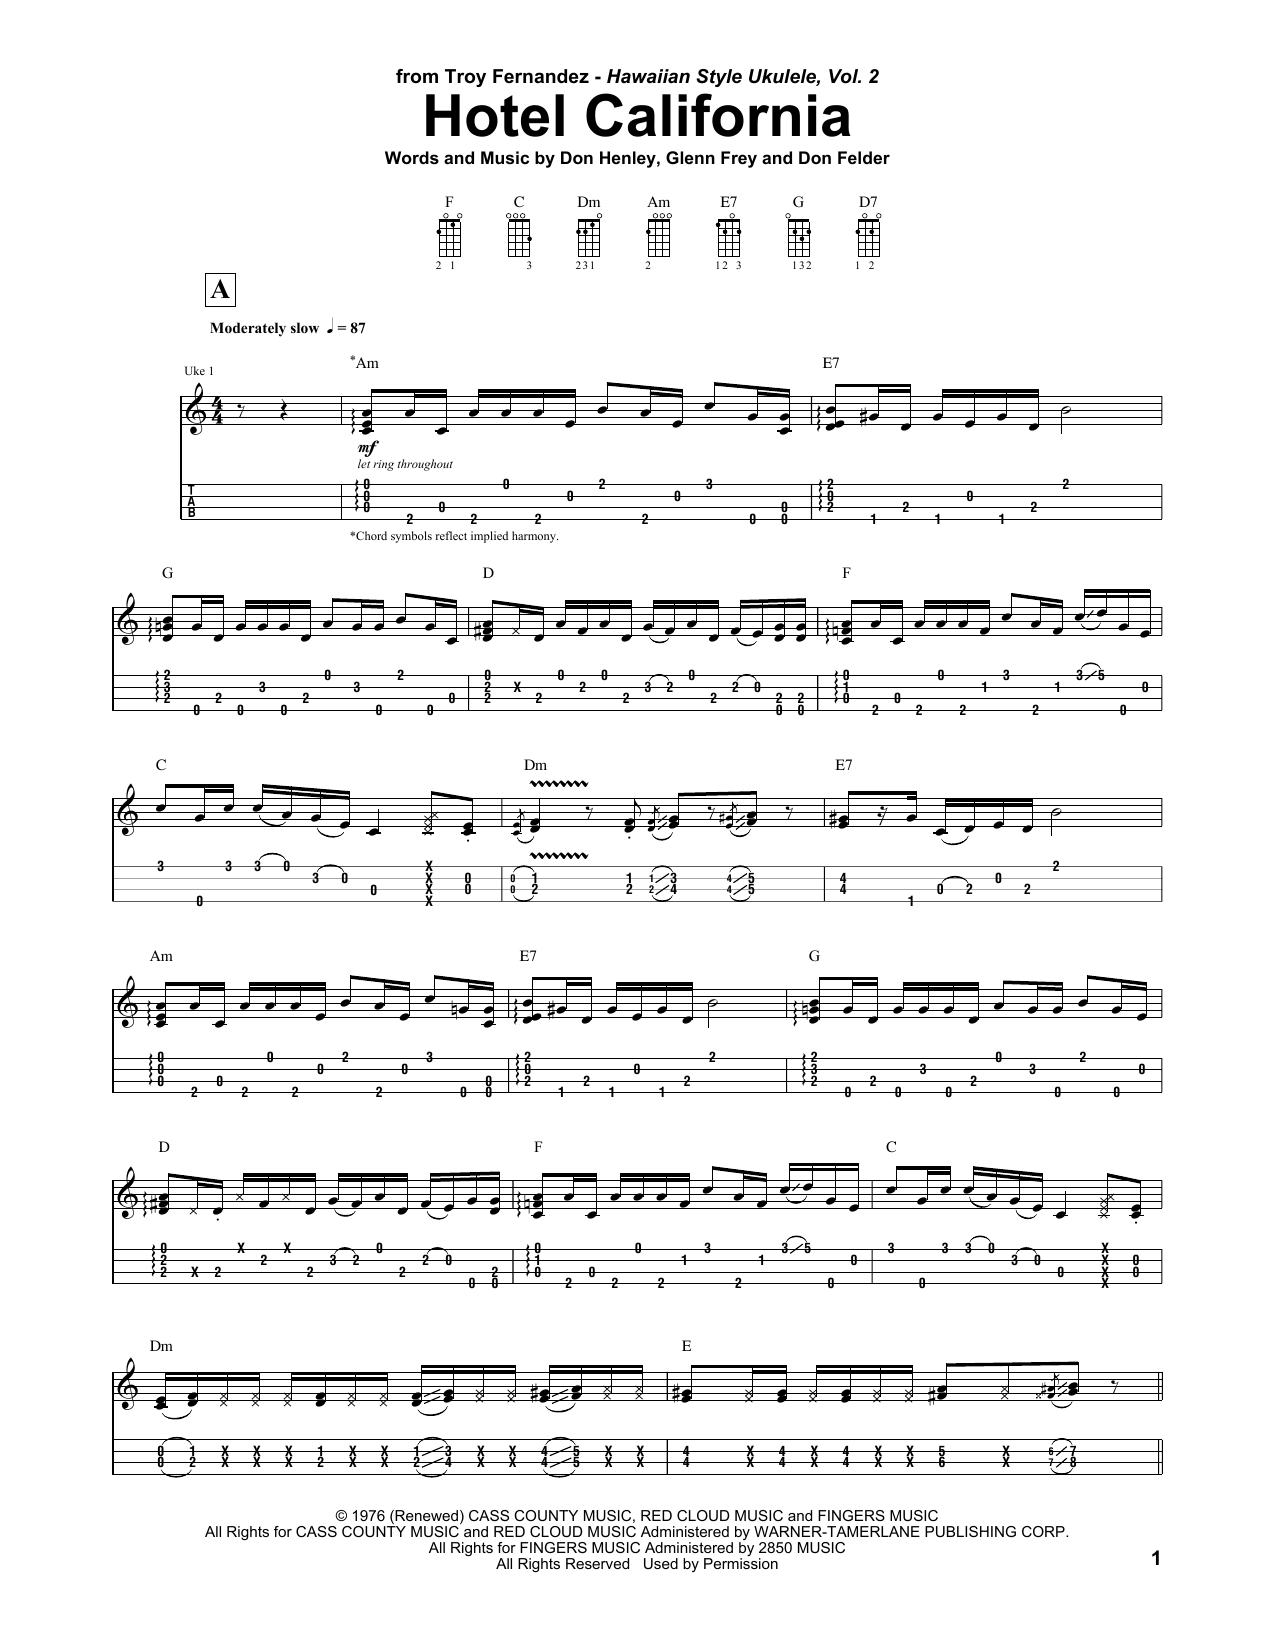 Sheet music digital files to print licensed don felder digital sheet music digital by merriam music hexwebz Images